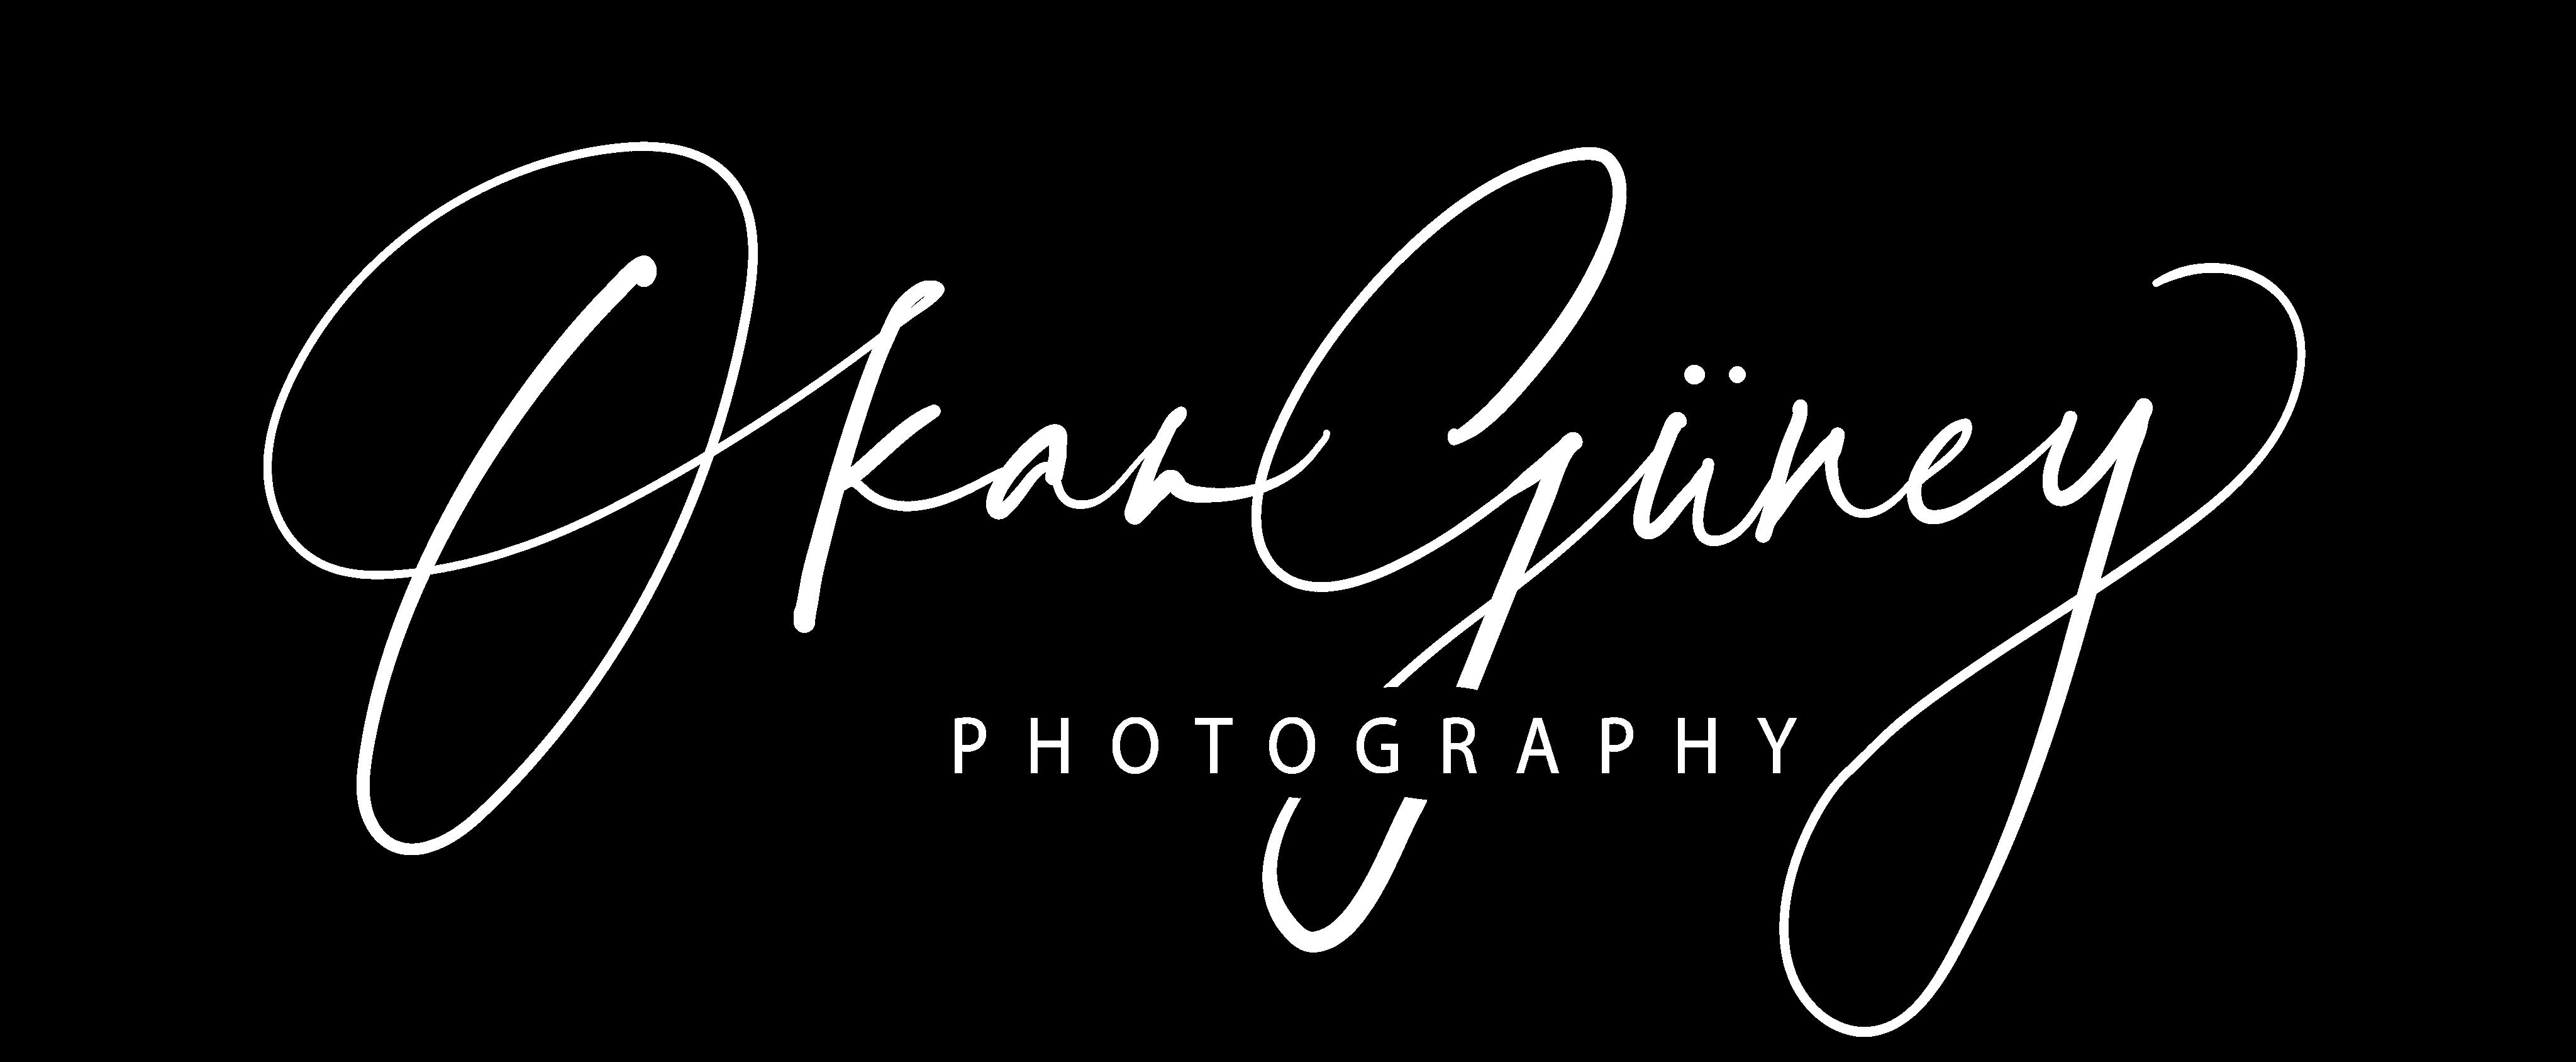 OG Photography